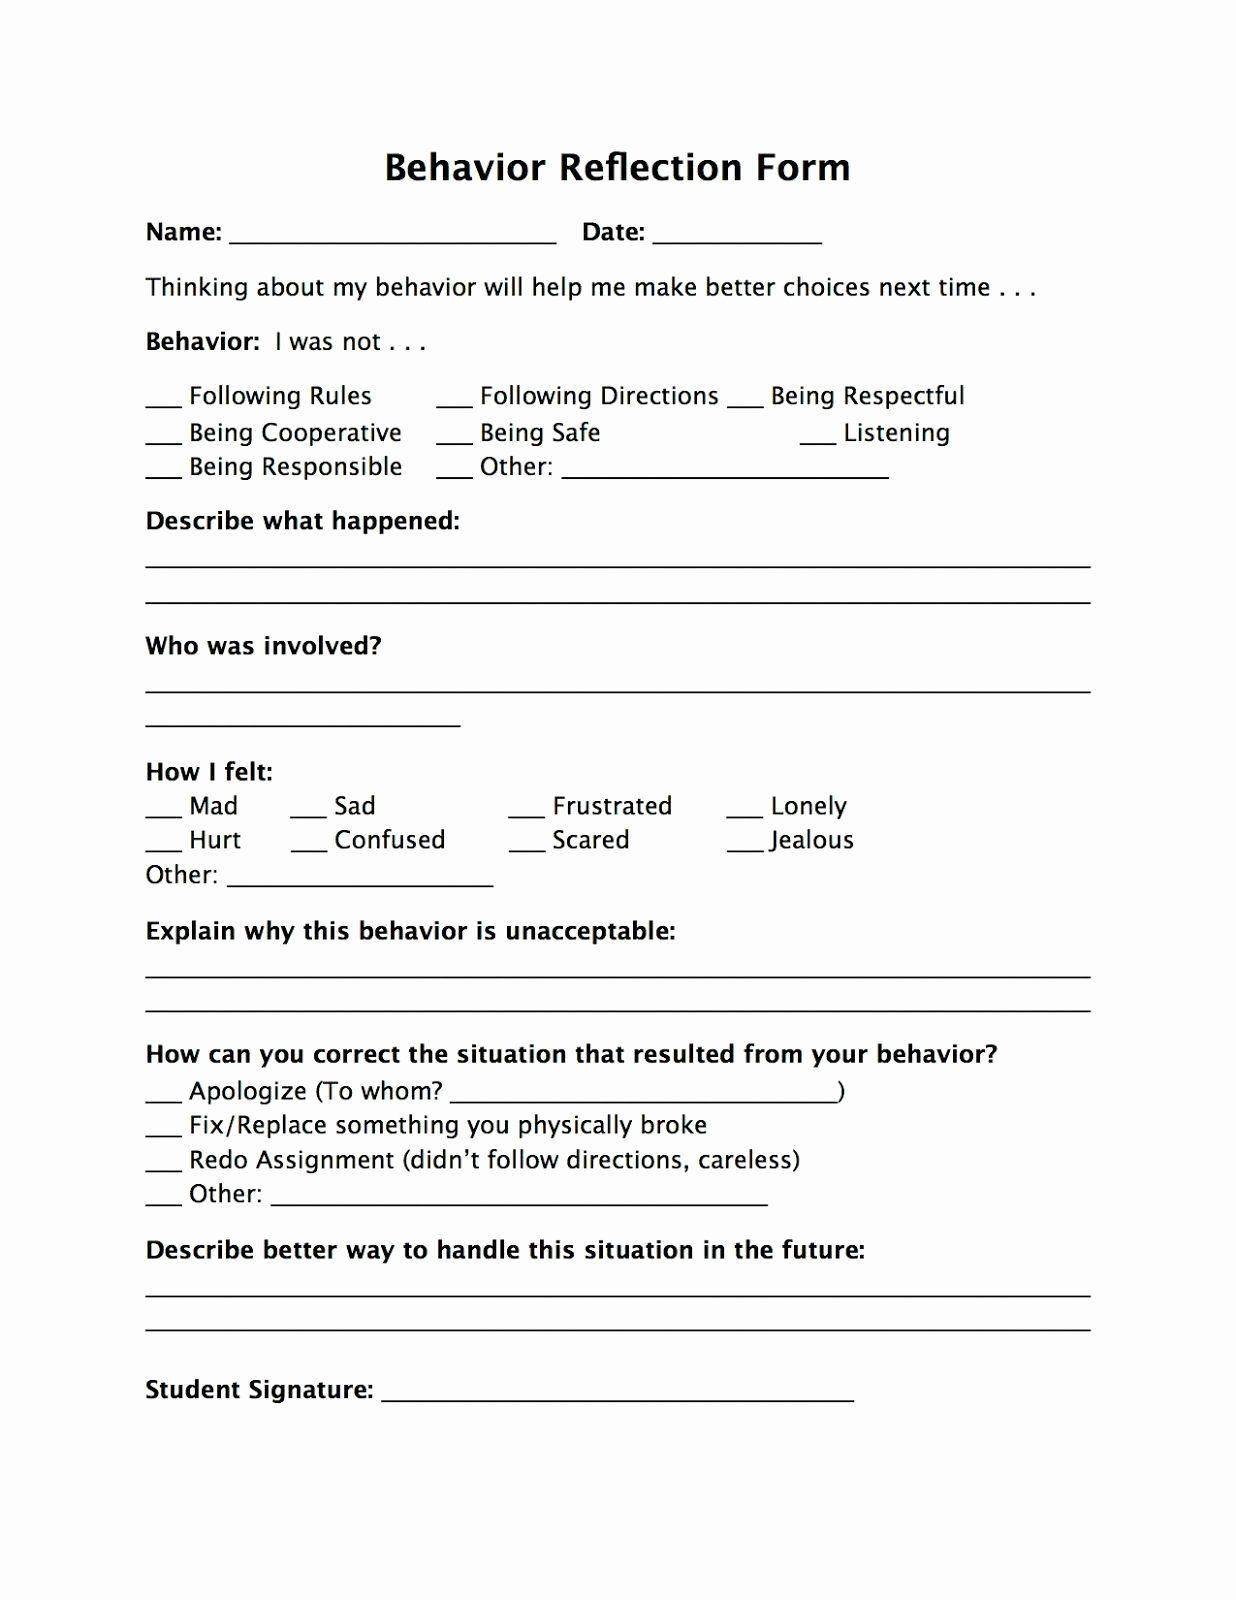 Appropriate Classroom Behavior Essay Unique Reflection Form Schule In 2020 Management